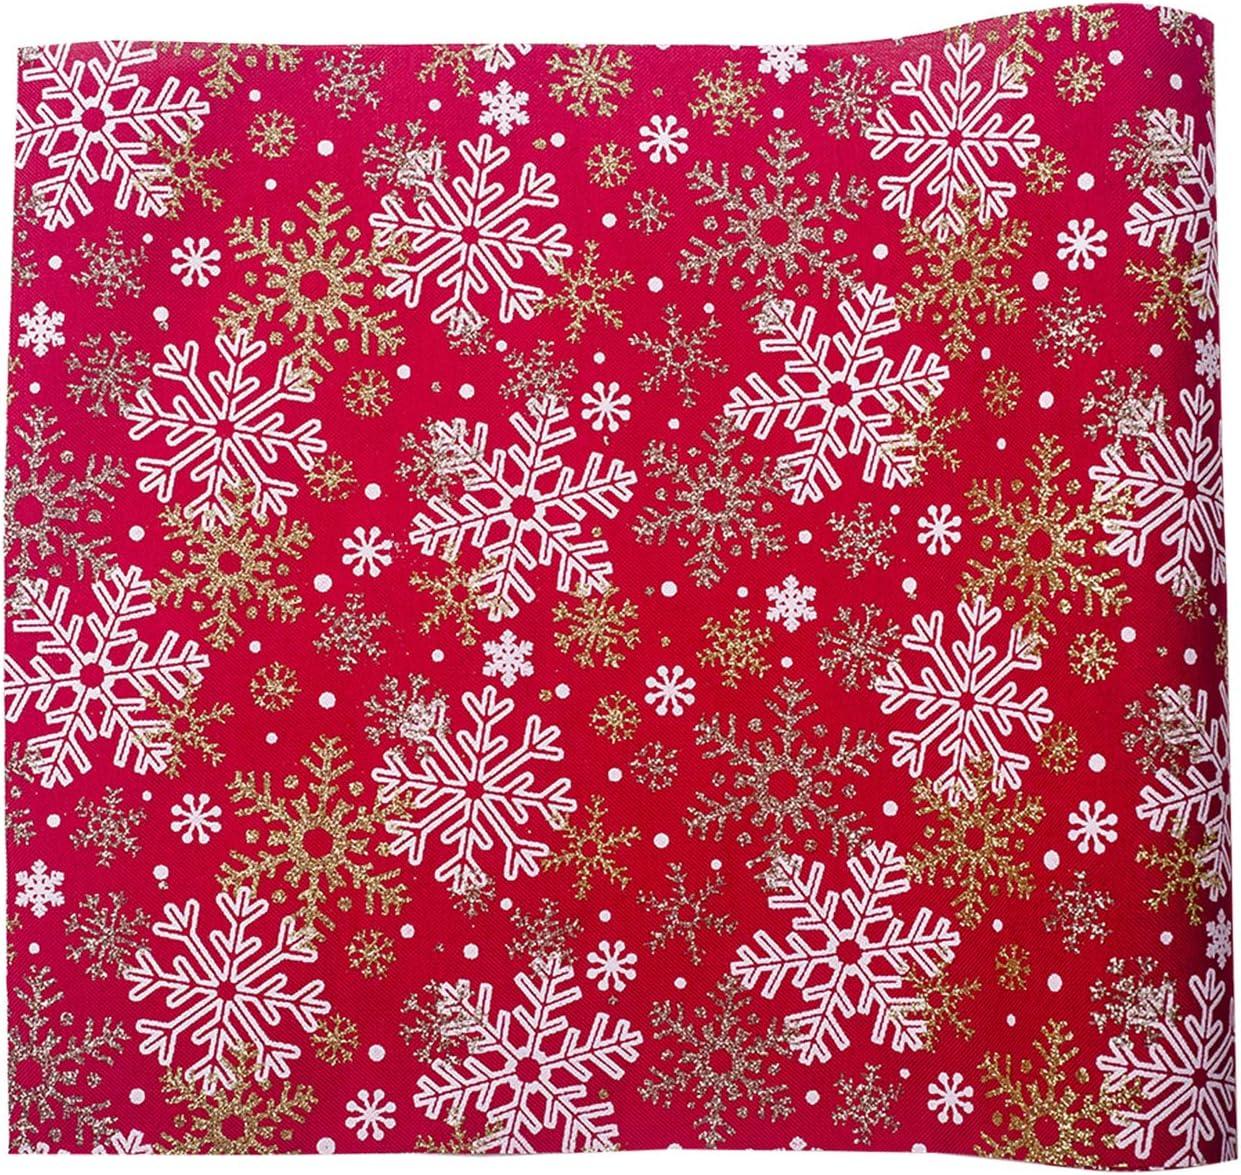 semen Camino de Mesa Rectangular Christmas de 106 Pulgadas x 12 Pulgadas para Bodas y Fiestas Beige Snow Size:Length270cm//106.3 Width30cm//11.8